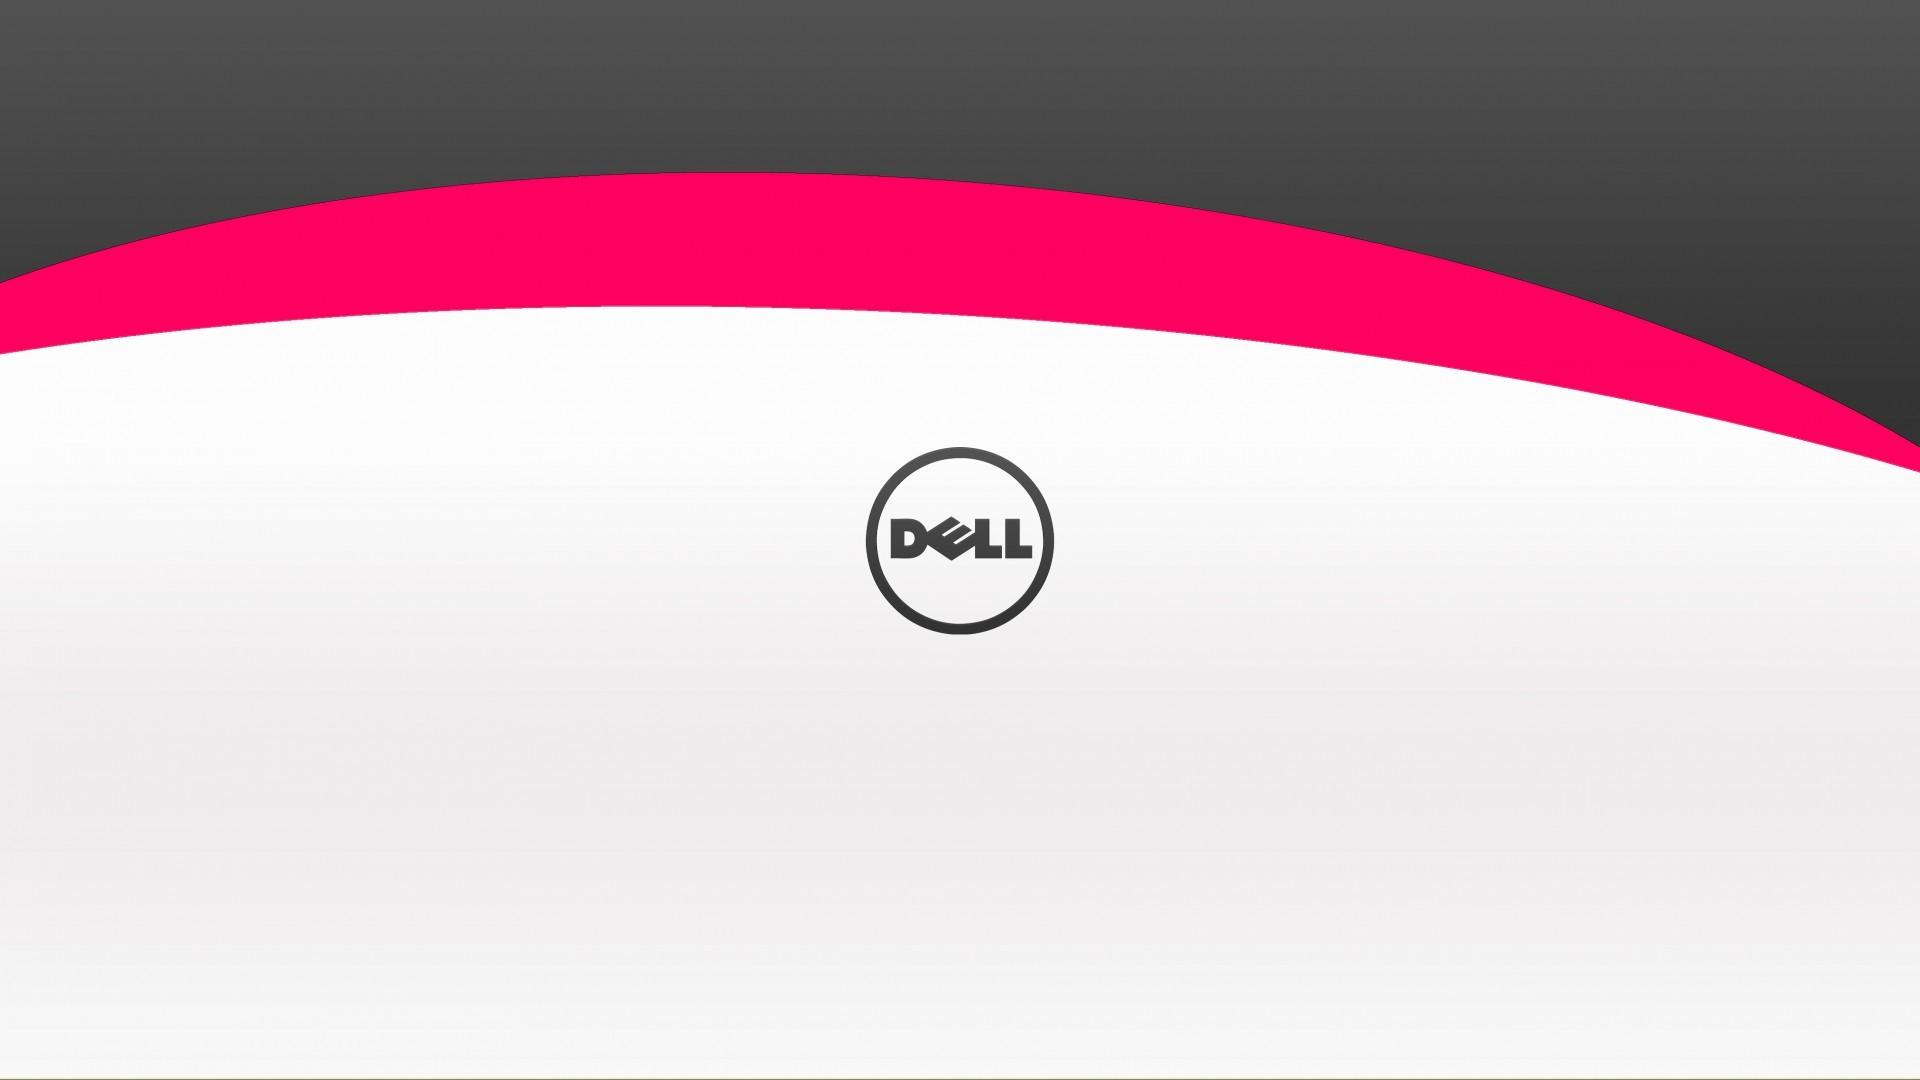 Dell Hd Wallpaper